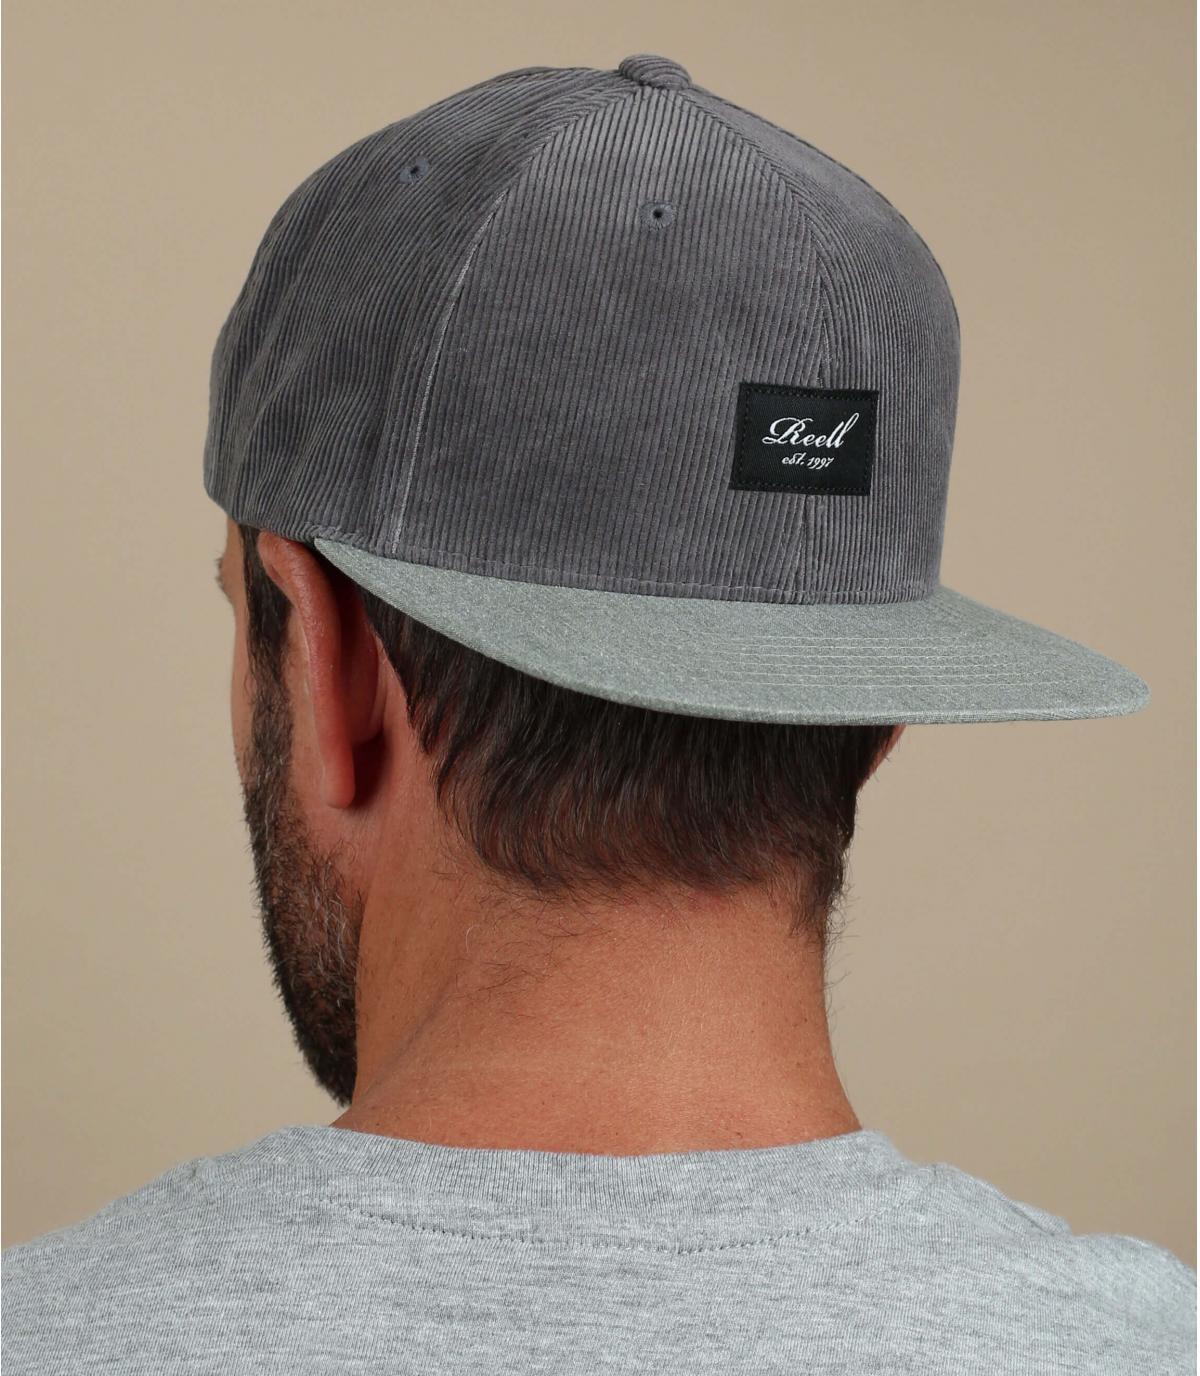 Reell snapback grey corduroy